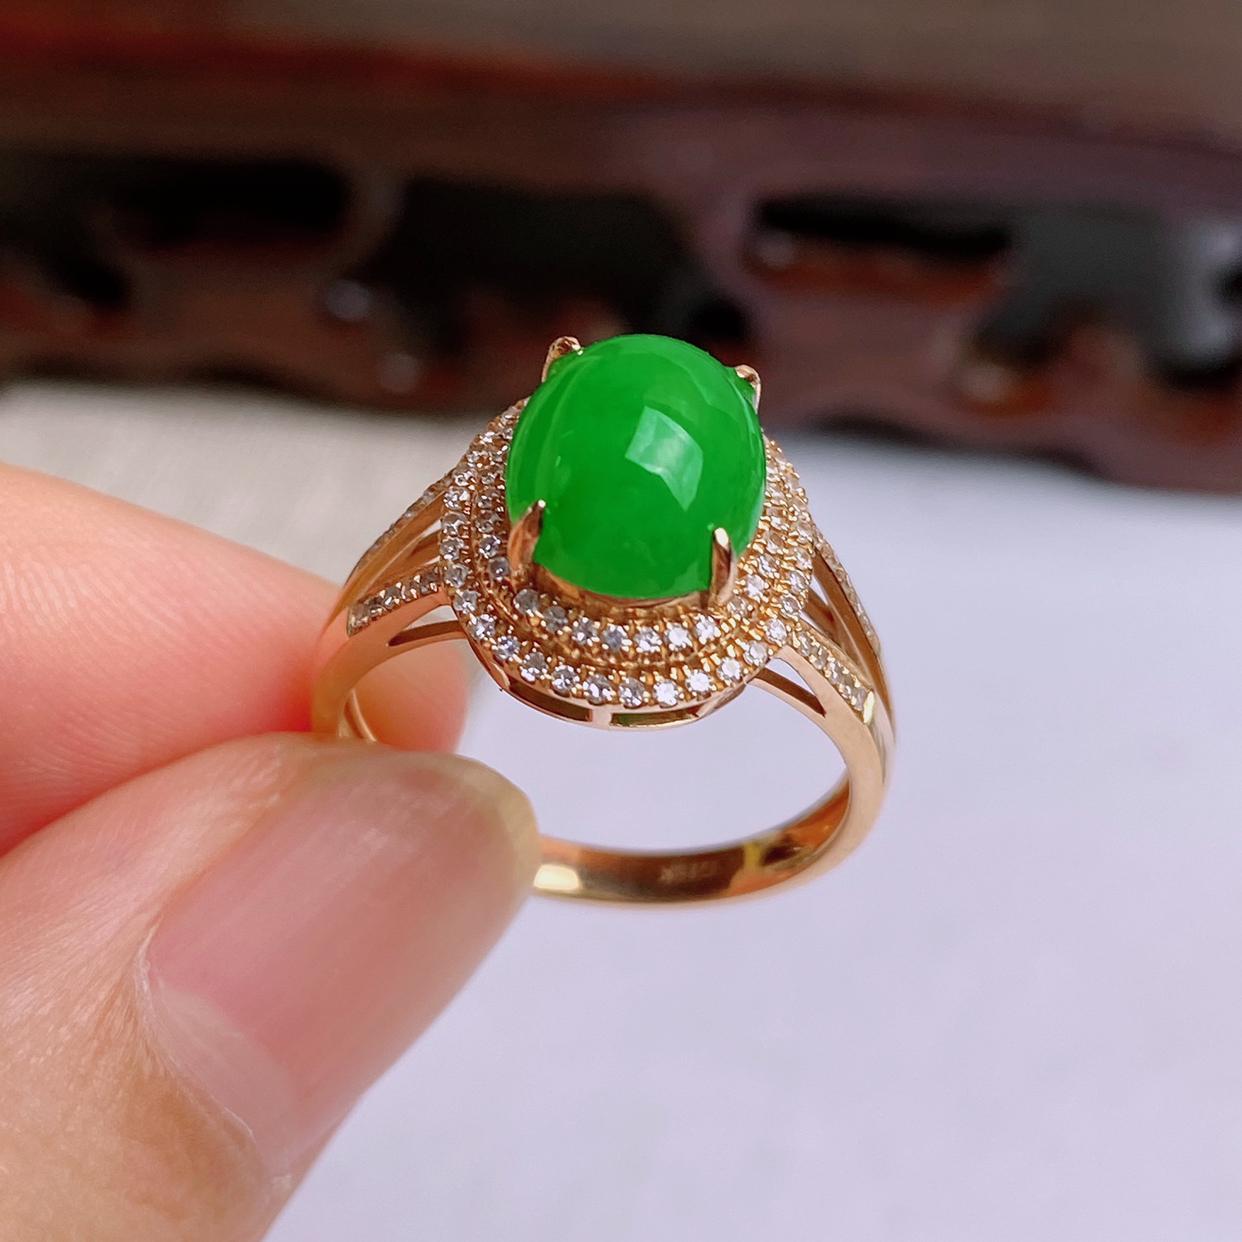 A货翡翠-种好满绿18K金伴钻蛋面戒指,尺寸-裸石9.5*7.6*5.4mm整体12.7*11.4*